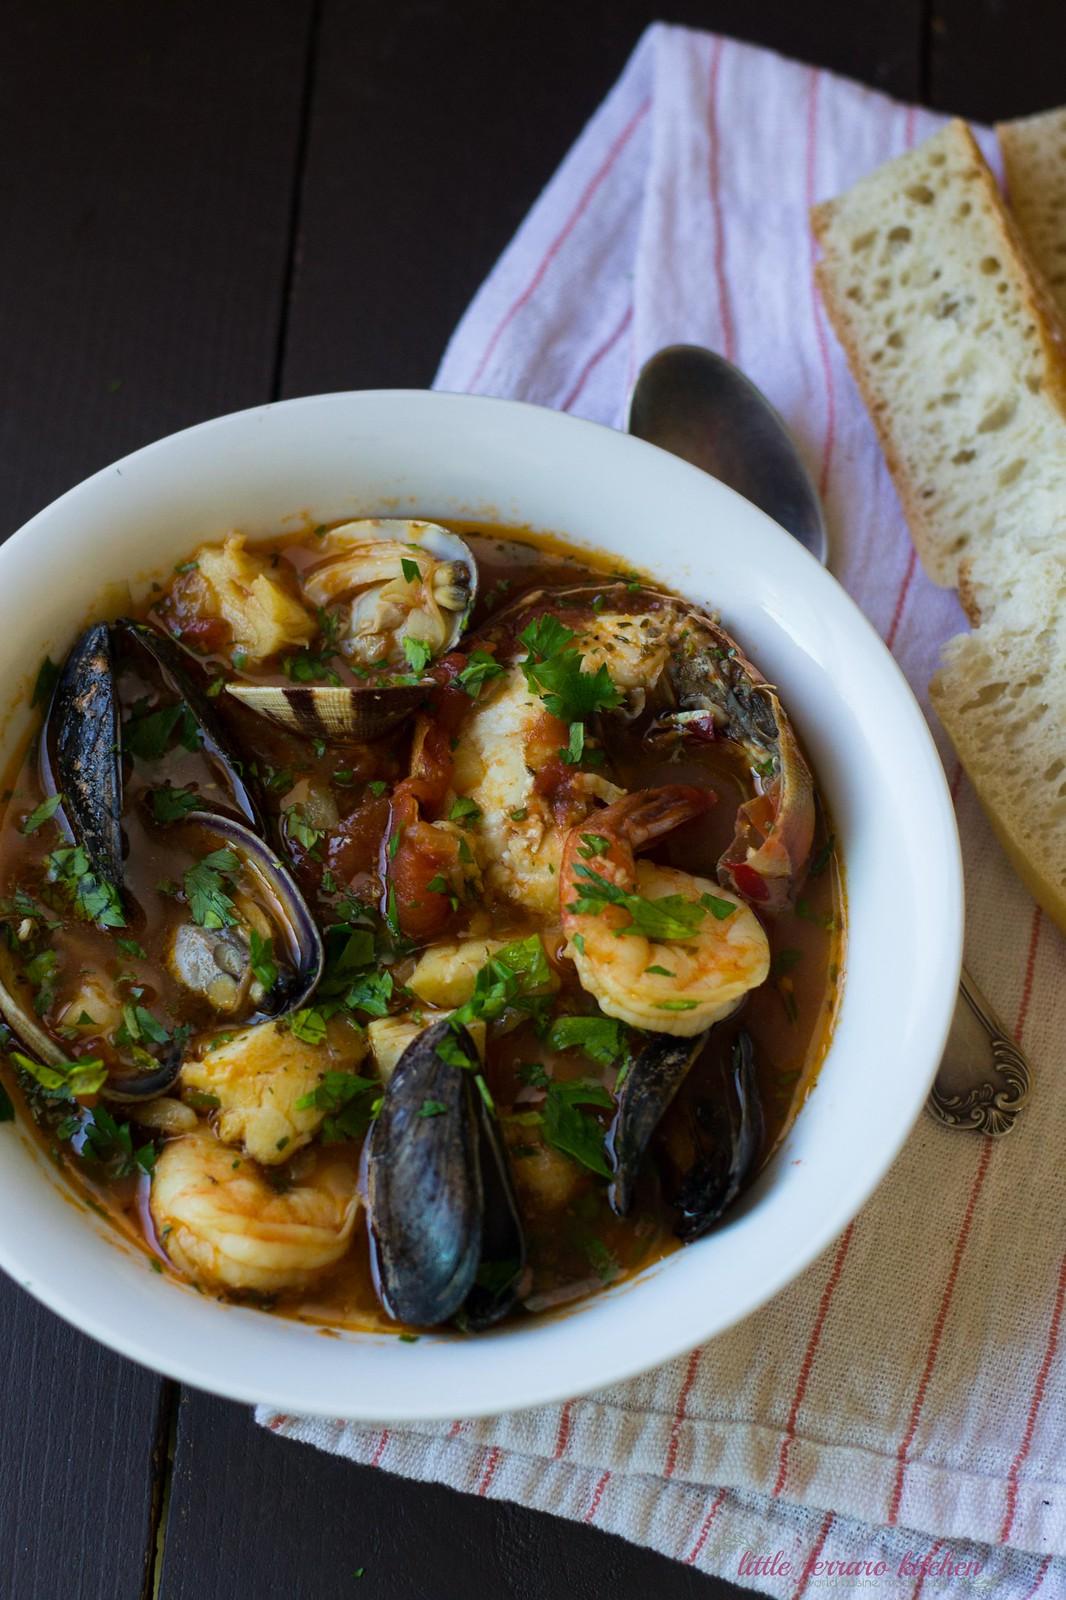 Cioppino (Seafood and Tomato Stew)